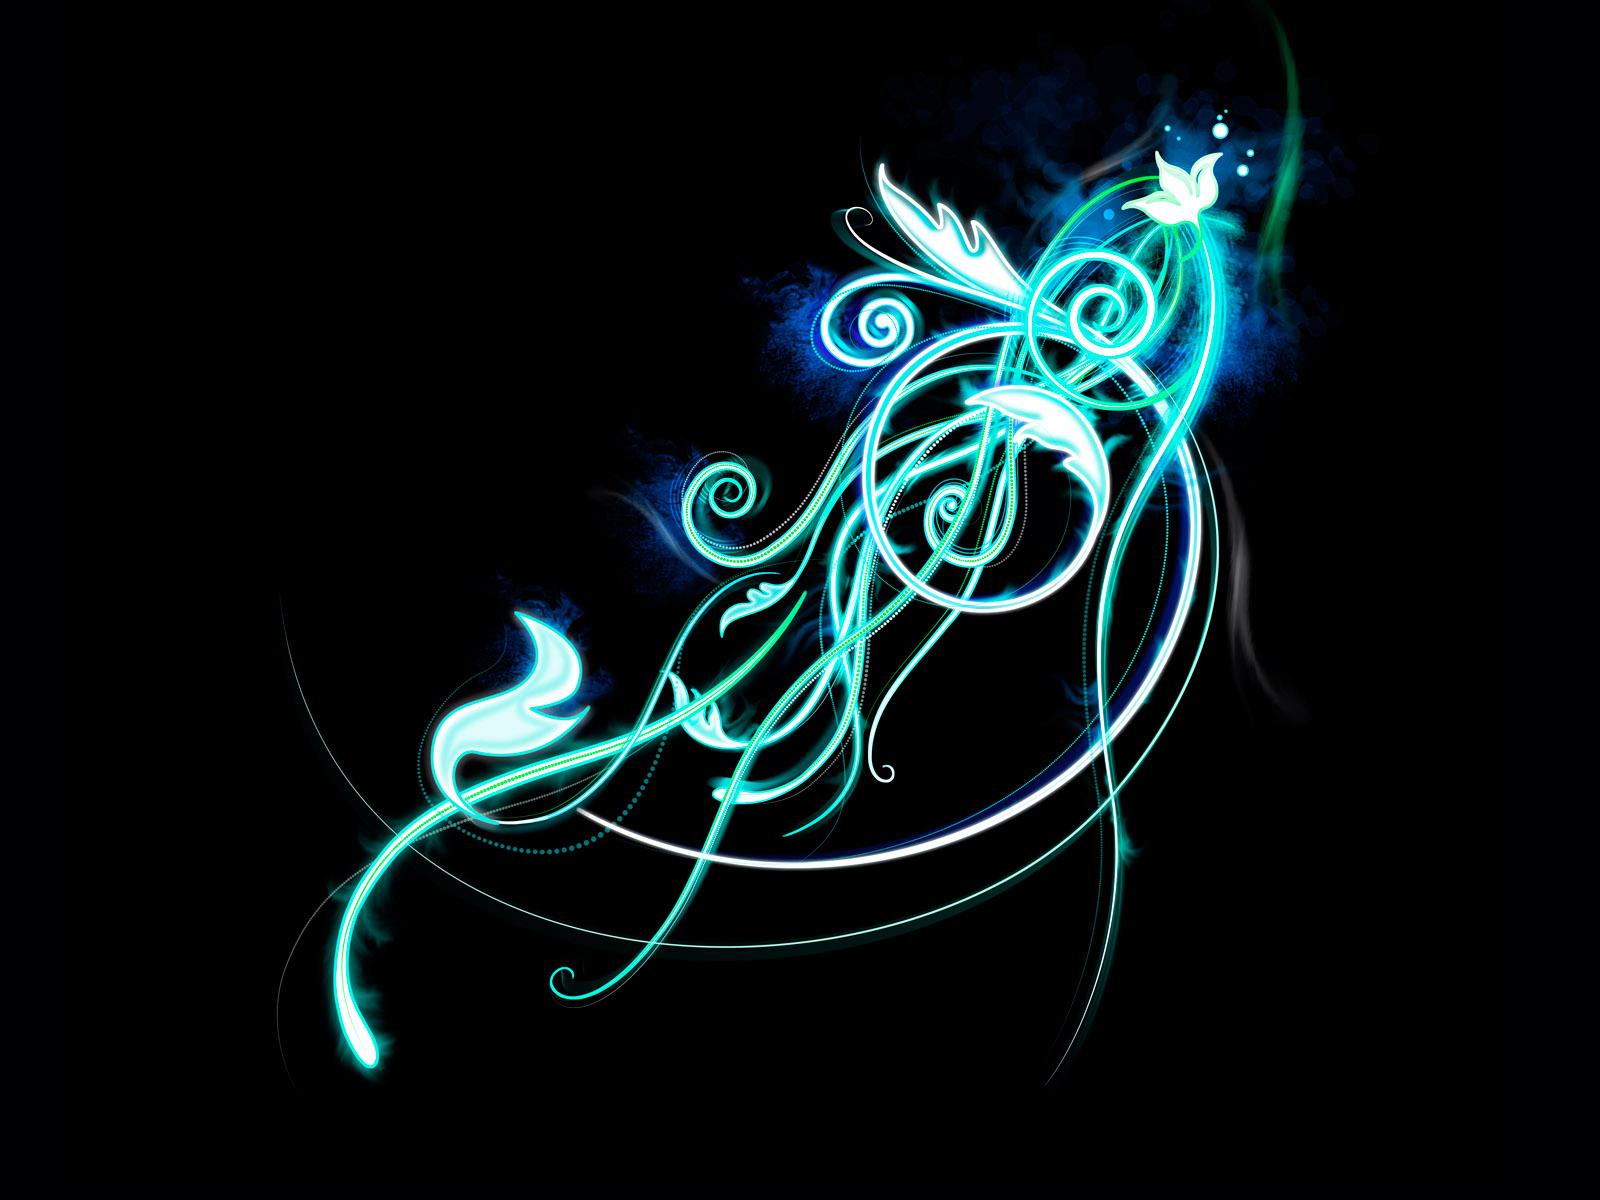 http://3.bp.blogspot.com/-RzwOq99z1Ok/TglakJVYRDI/AAAAAAAAAd8/XoahMySGESQ/s1600/Sensational-Wallpaper.jpg